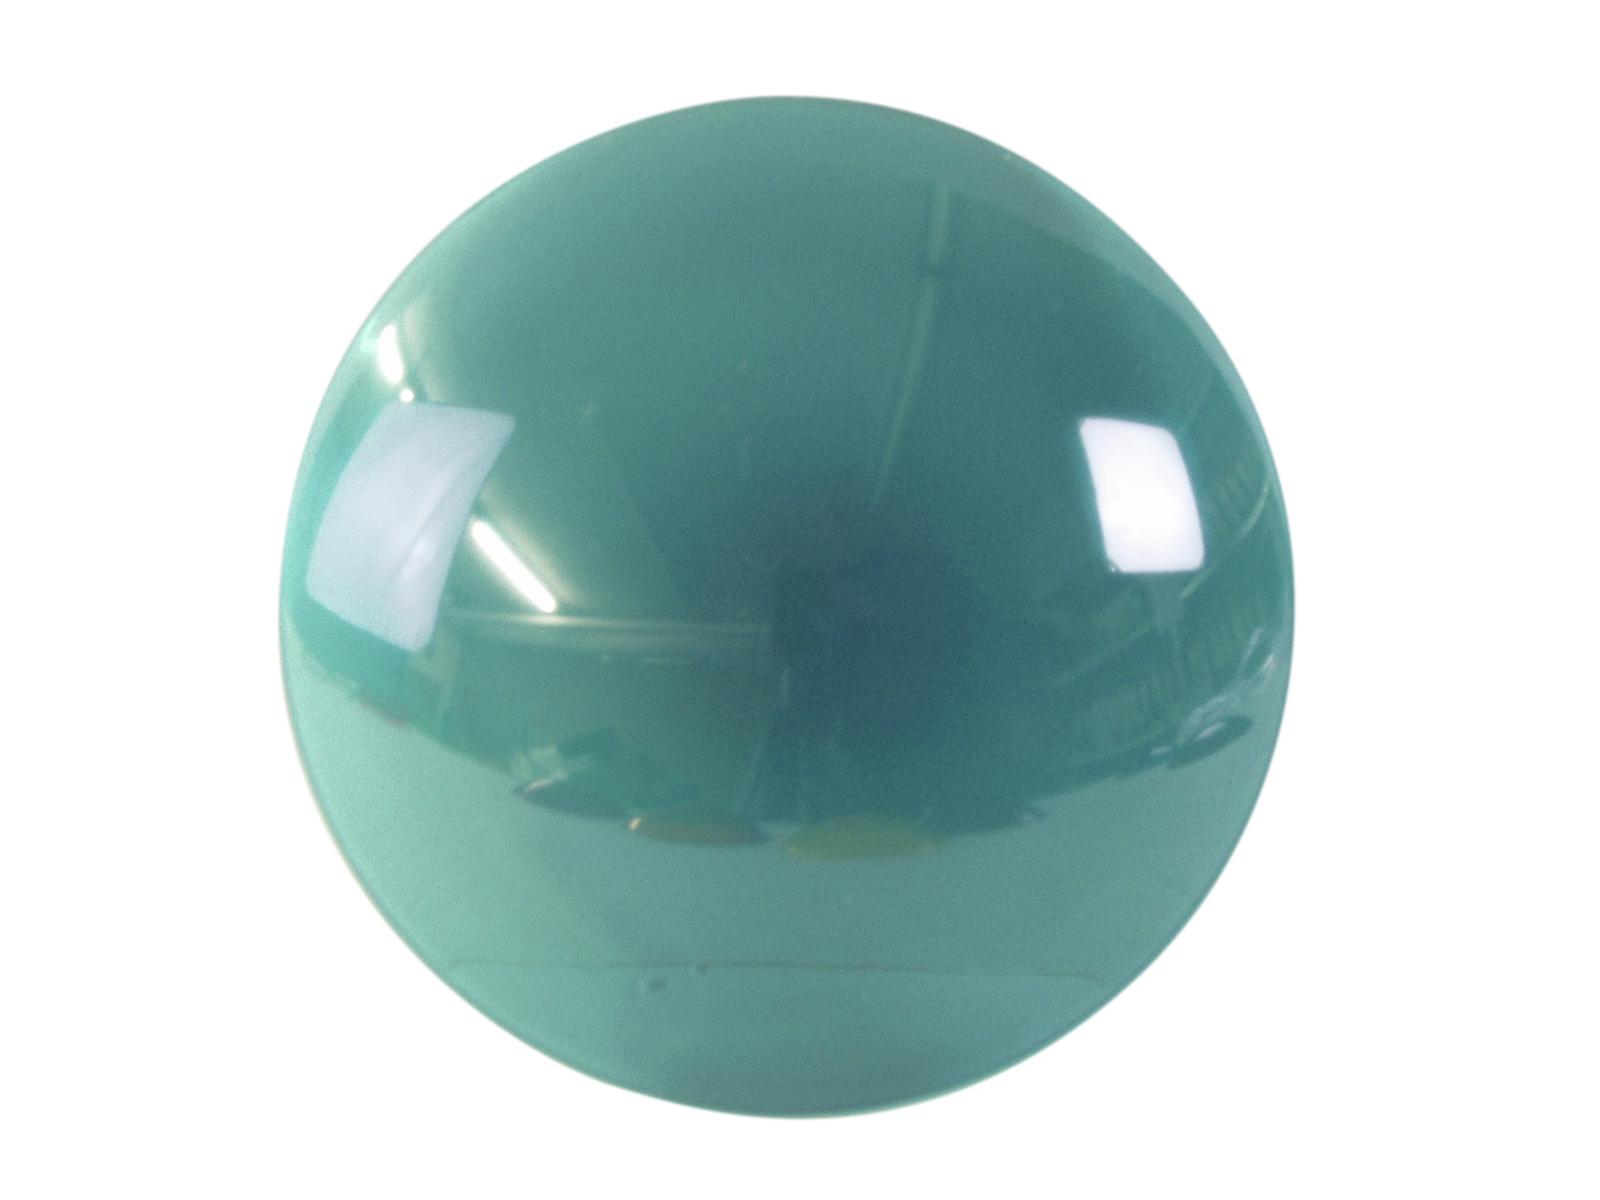 EUROLITE Farbkappe für PAR-36, dunkelgrün